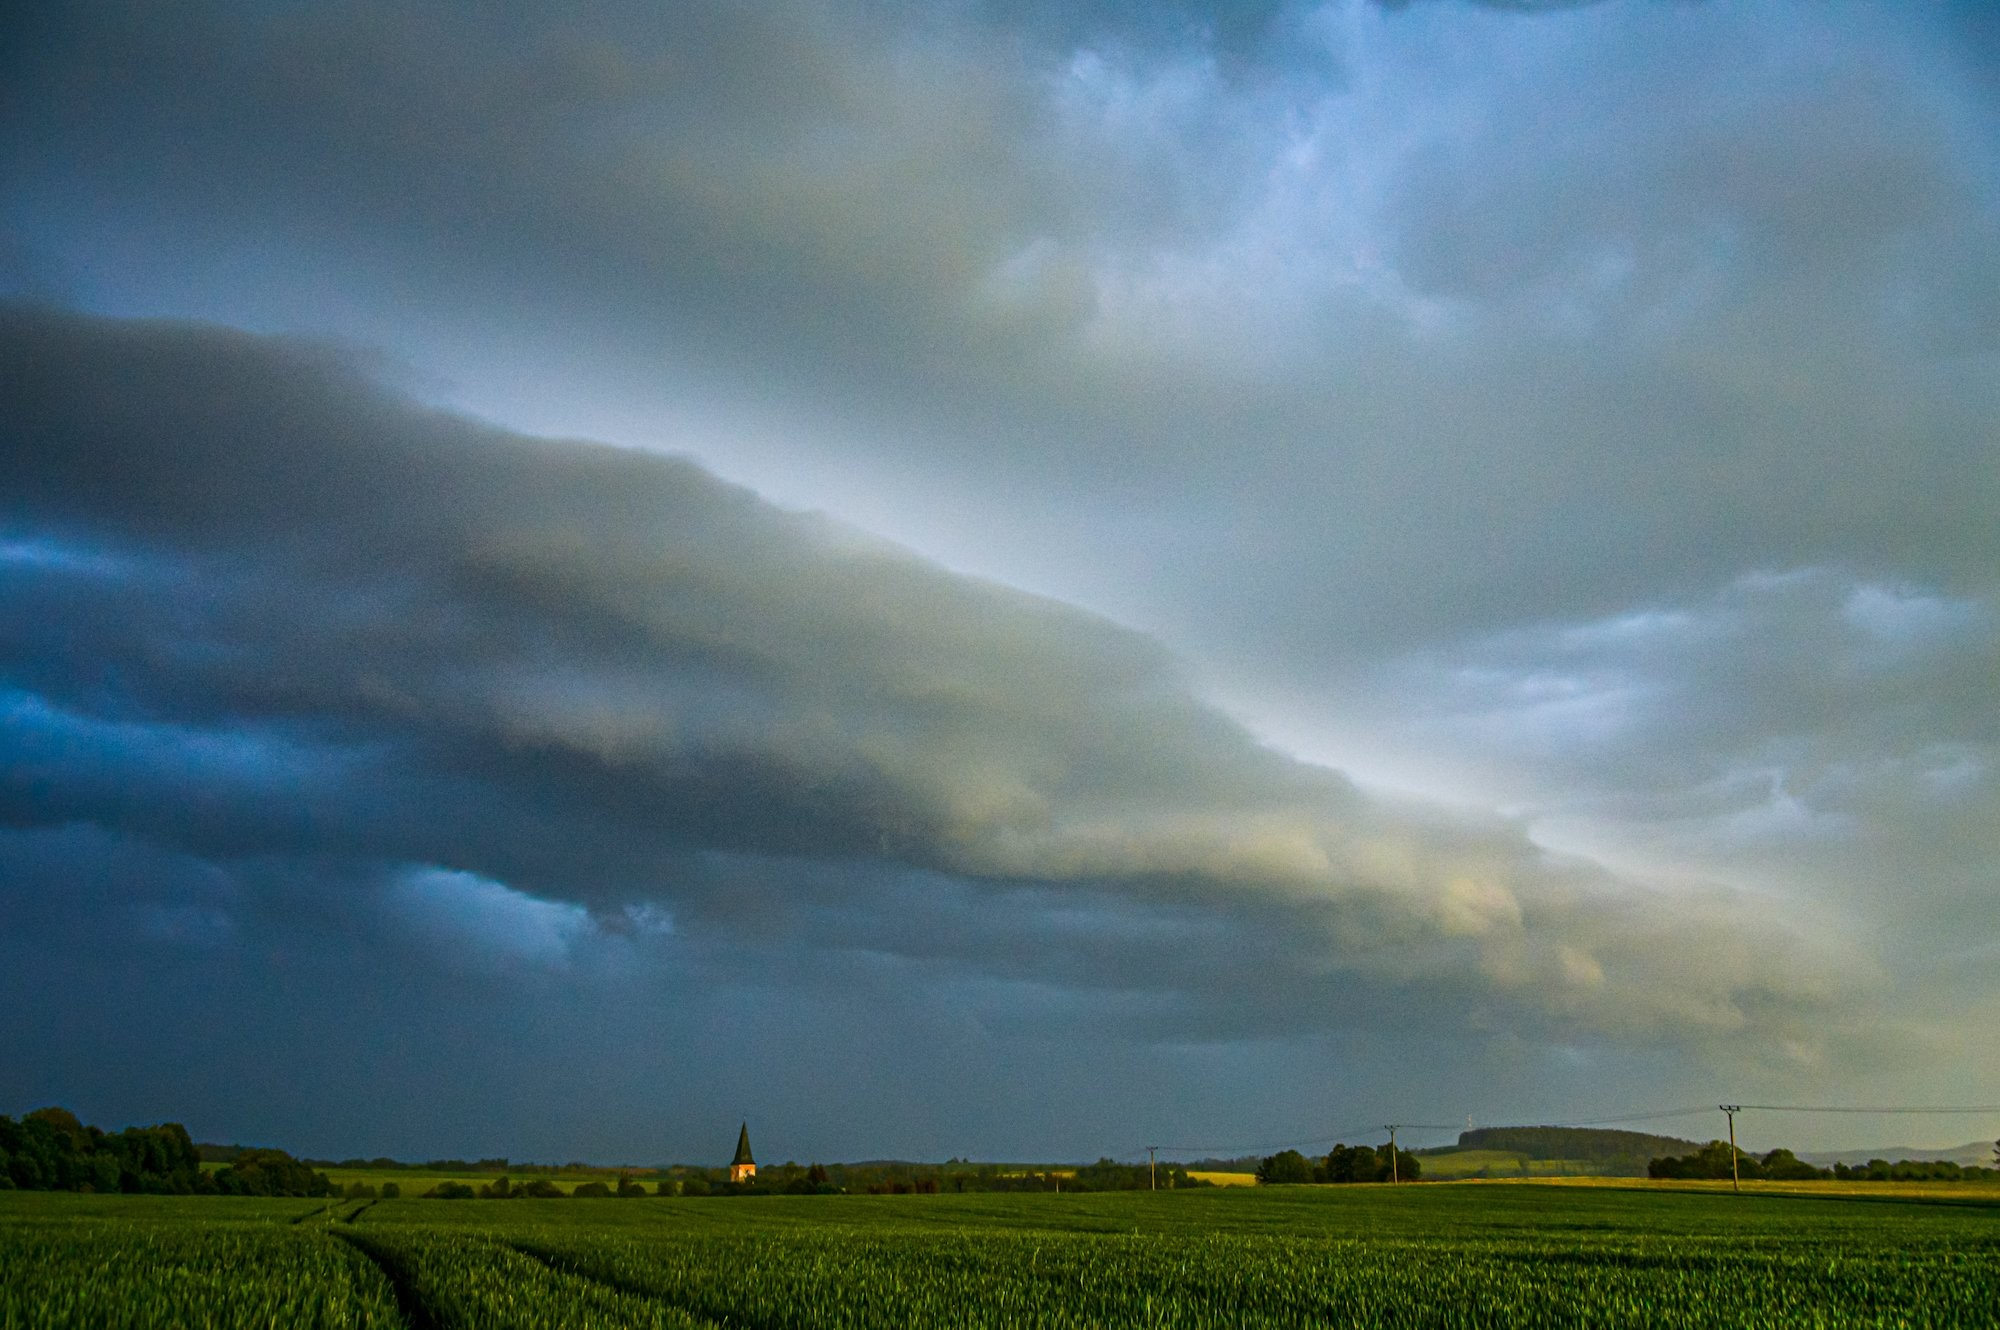 Shelf cloud nad Trutnovskem